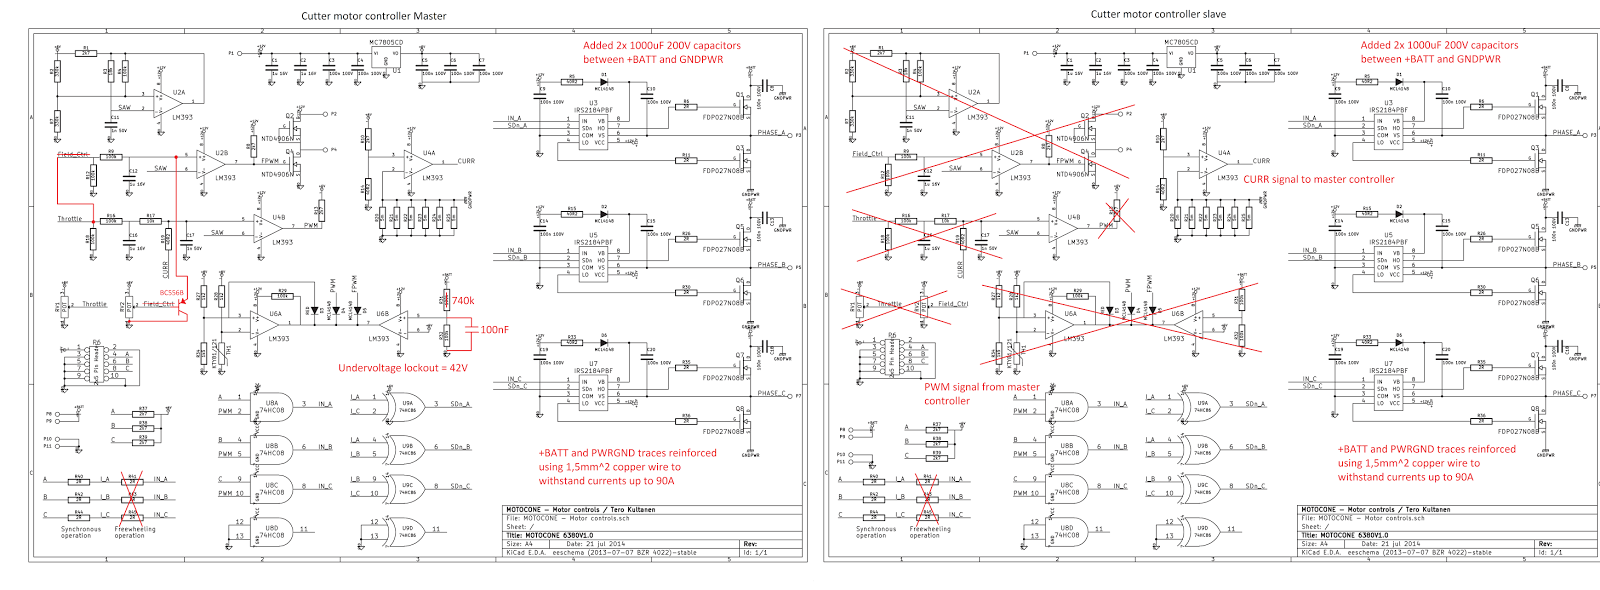 Stiga Garden Electric Conversion Part 4 6 Phase Cut Motor Schematic Https Drivegooglecom File D 0b2d4l4eo4edys015sxnmaupusta